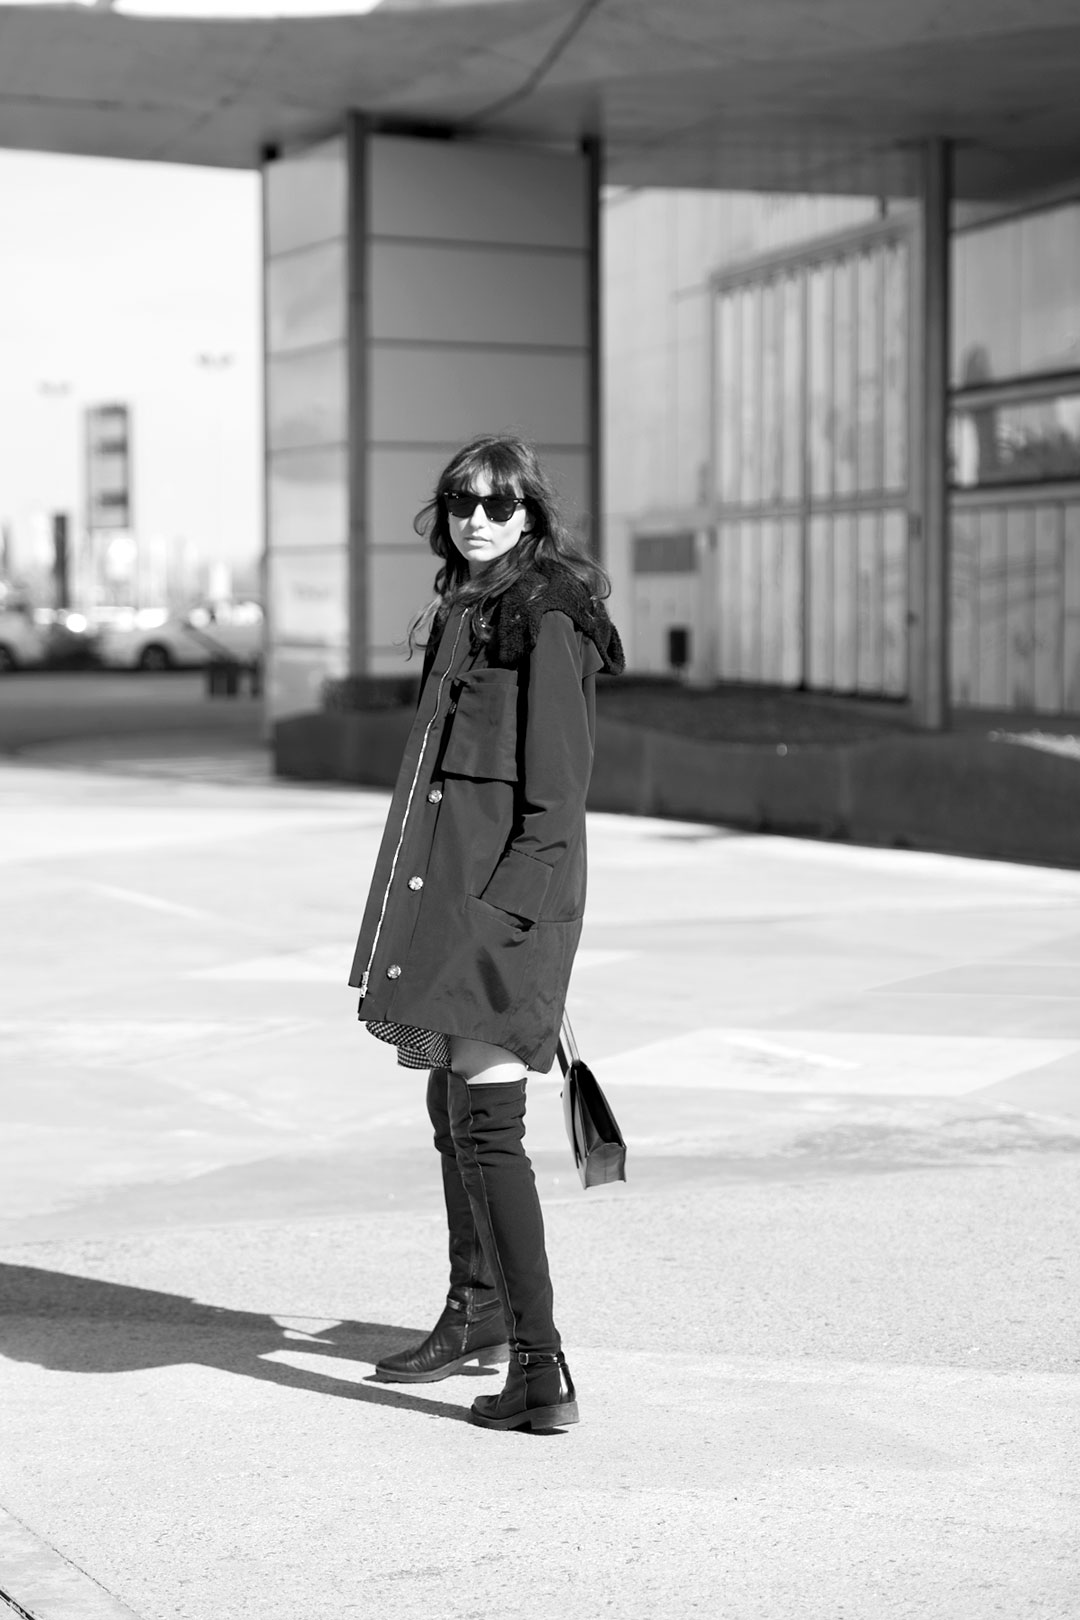 mbfwm-black-and-white-street-style-mitmeblog-bn-web-02